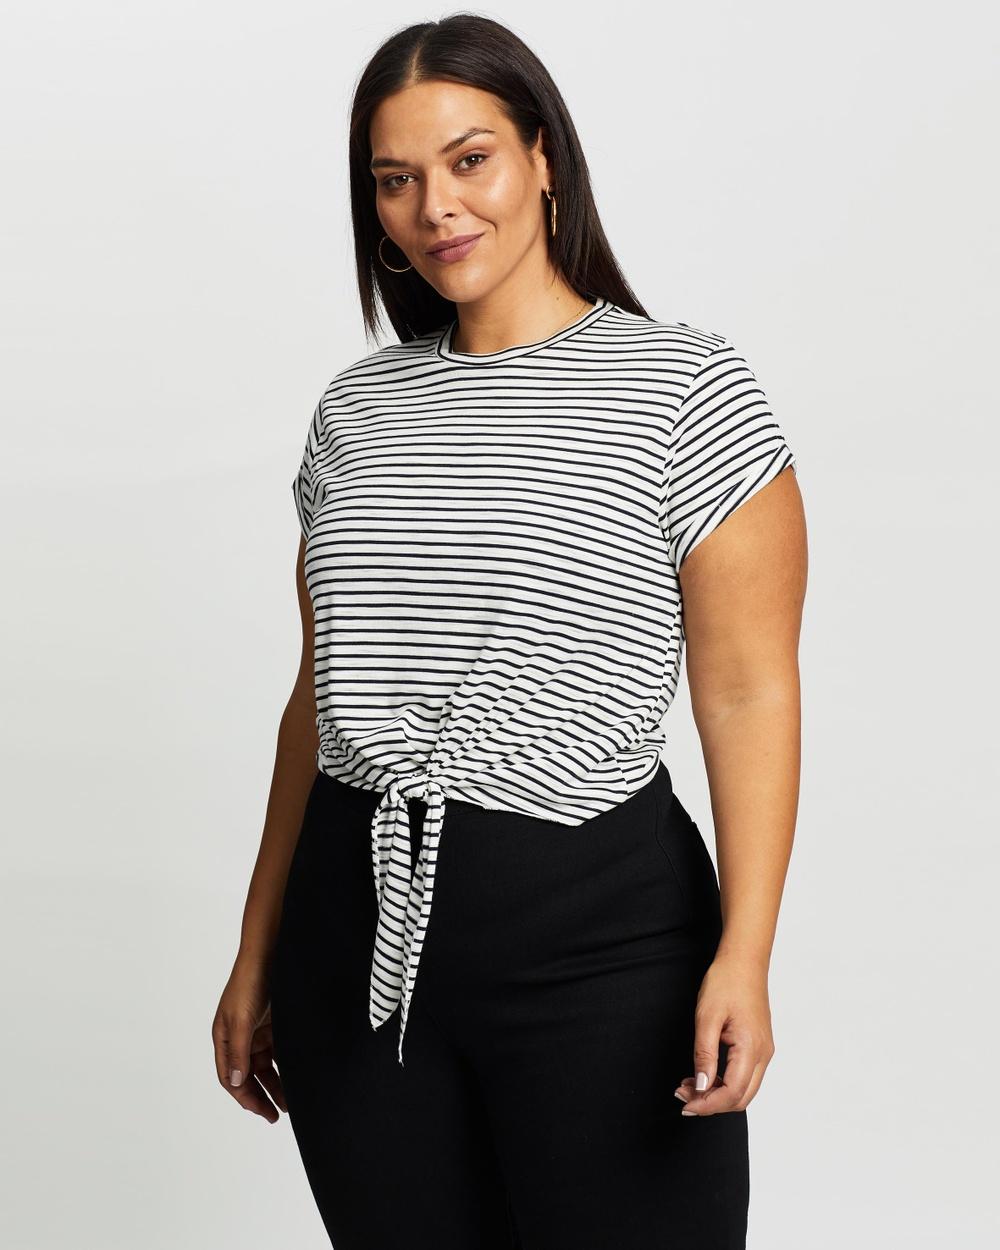 Atmos&Here Curvy - Cassie Tie Front Tee - T-Shirts & Singlets (Navy Stripe) Cassie Tie Front Tee